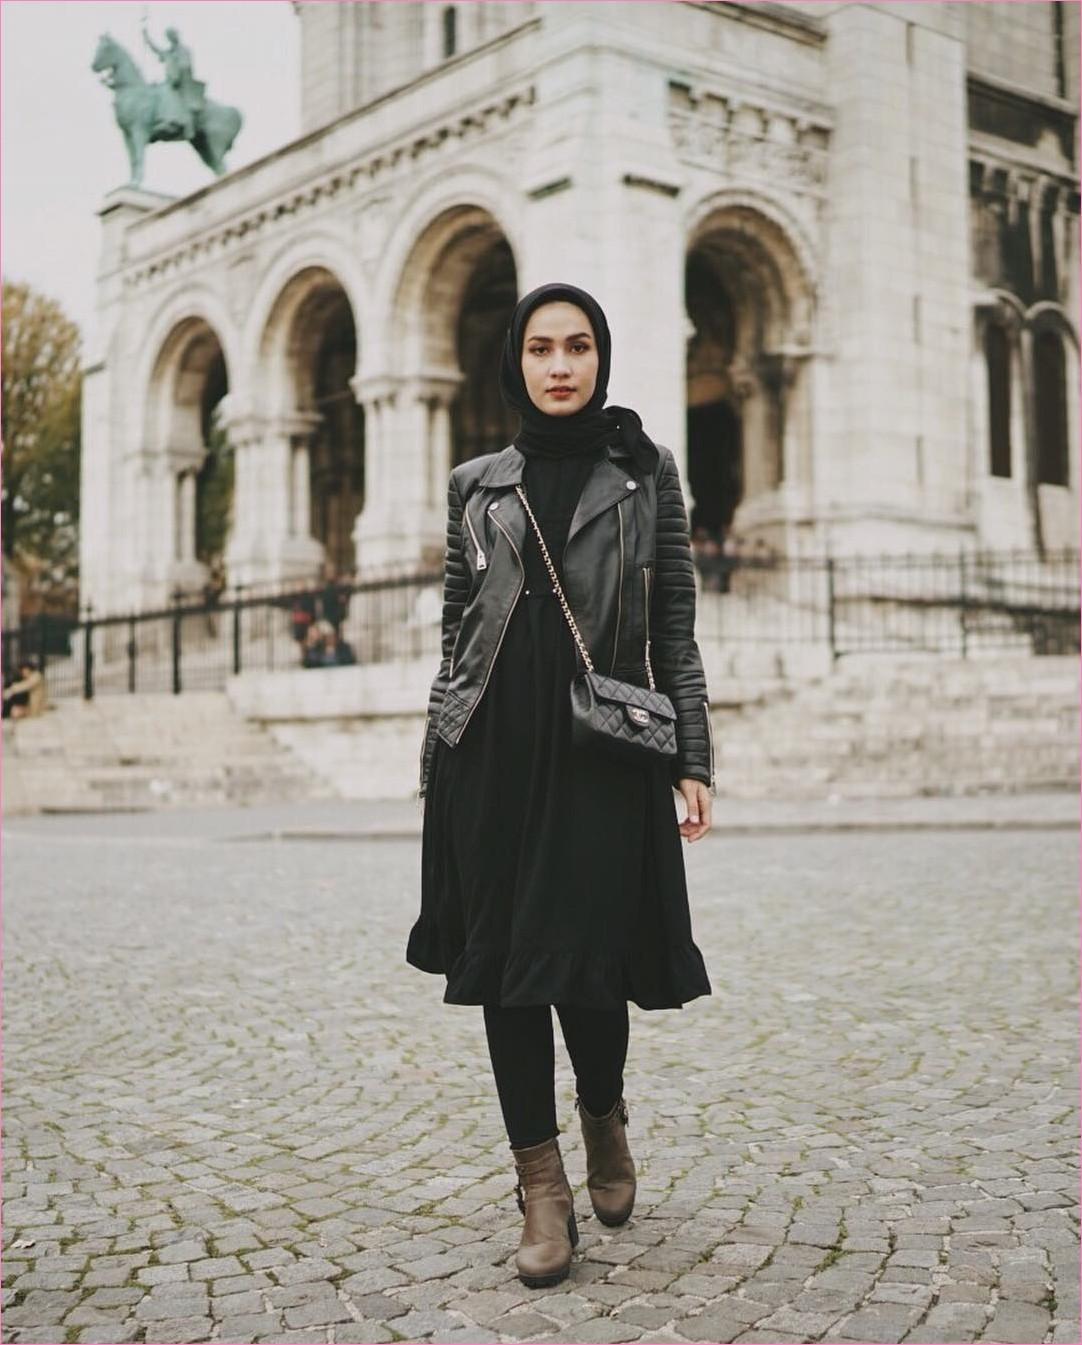 Outfit Baju Traveler Berhijab untuk Keluar Negri Ala Selebgram 2018 square hijab polos slingbags channel jacket kulit dress abaya tunic legging hitam boots coklat tua ootd outfit trendy london ciput rajut kerudung segiempat coat